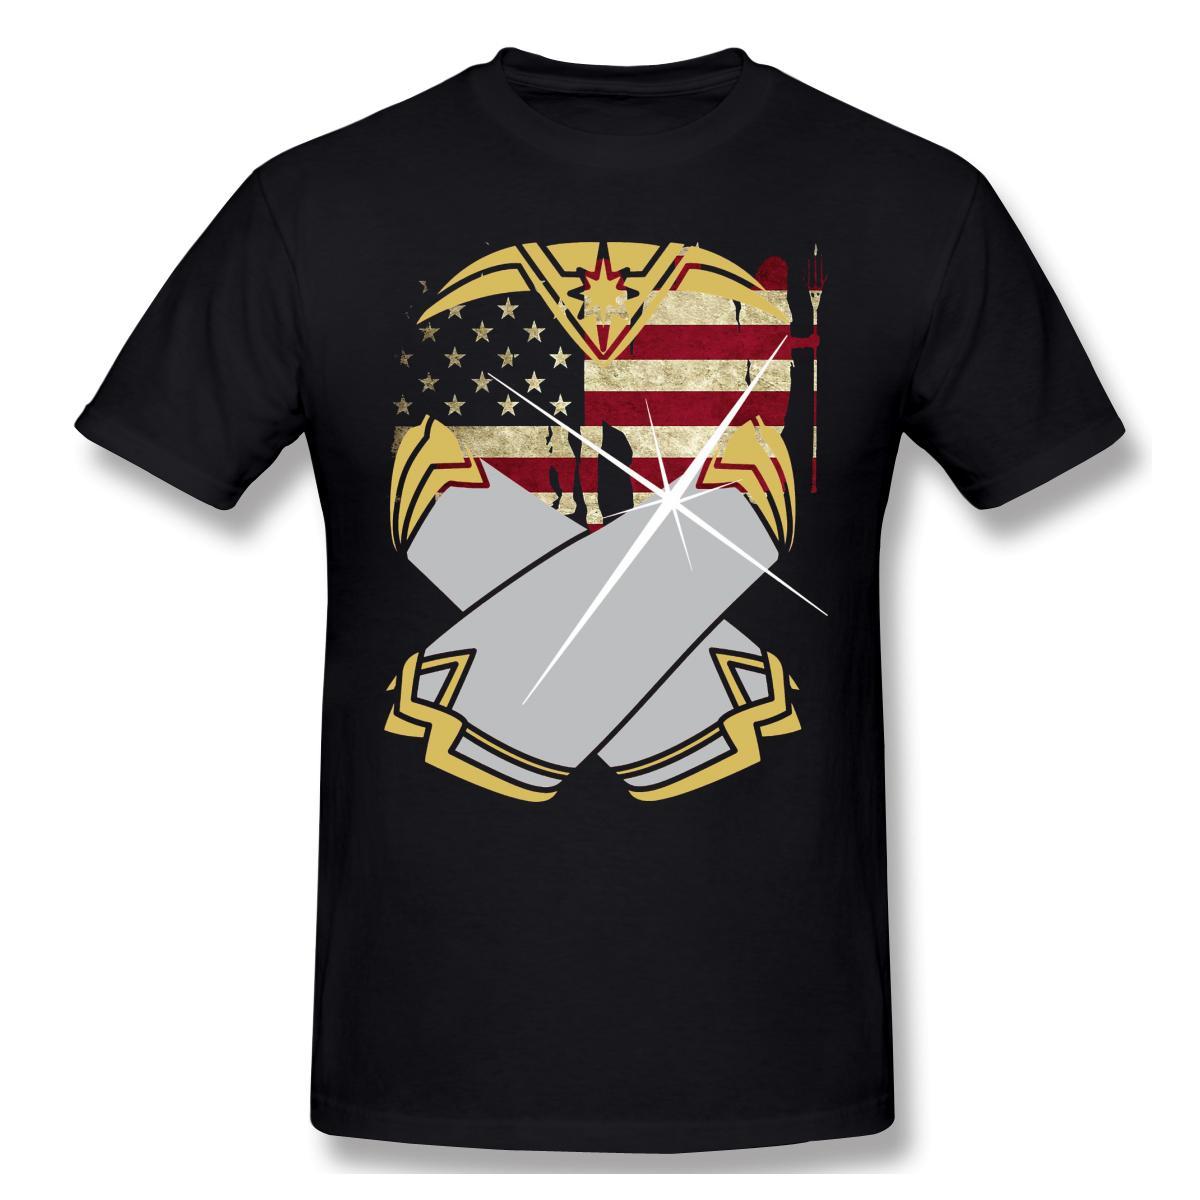 Energien-Armbänder lustiger T-Shirt Mann-Sommer-Baumwoll-T-Shirt Grafik-T-Wonder Woman Crew Neck Top freies Verschiffen